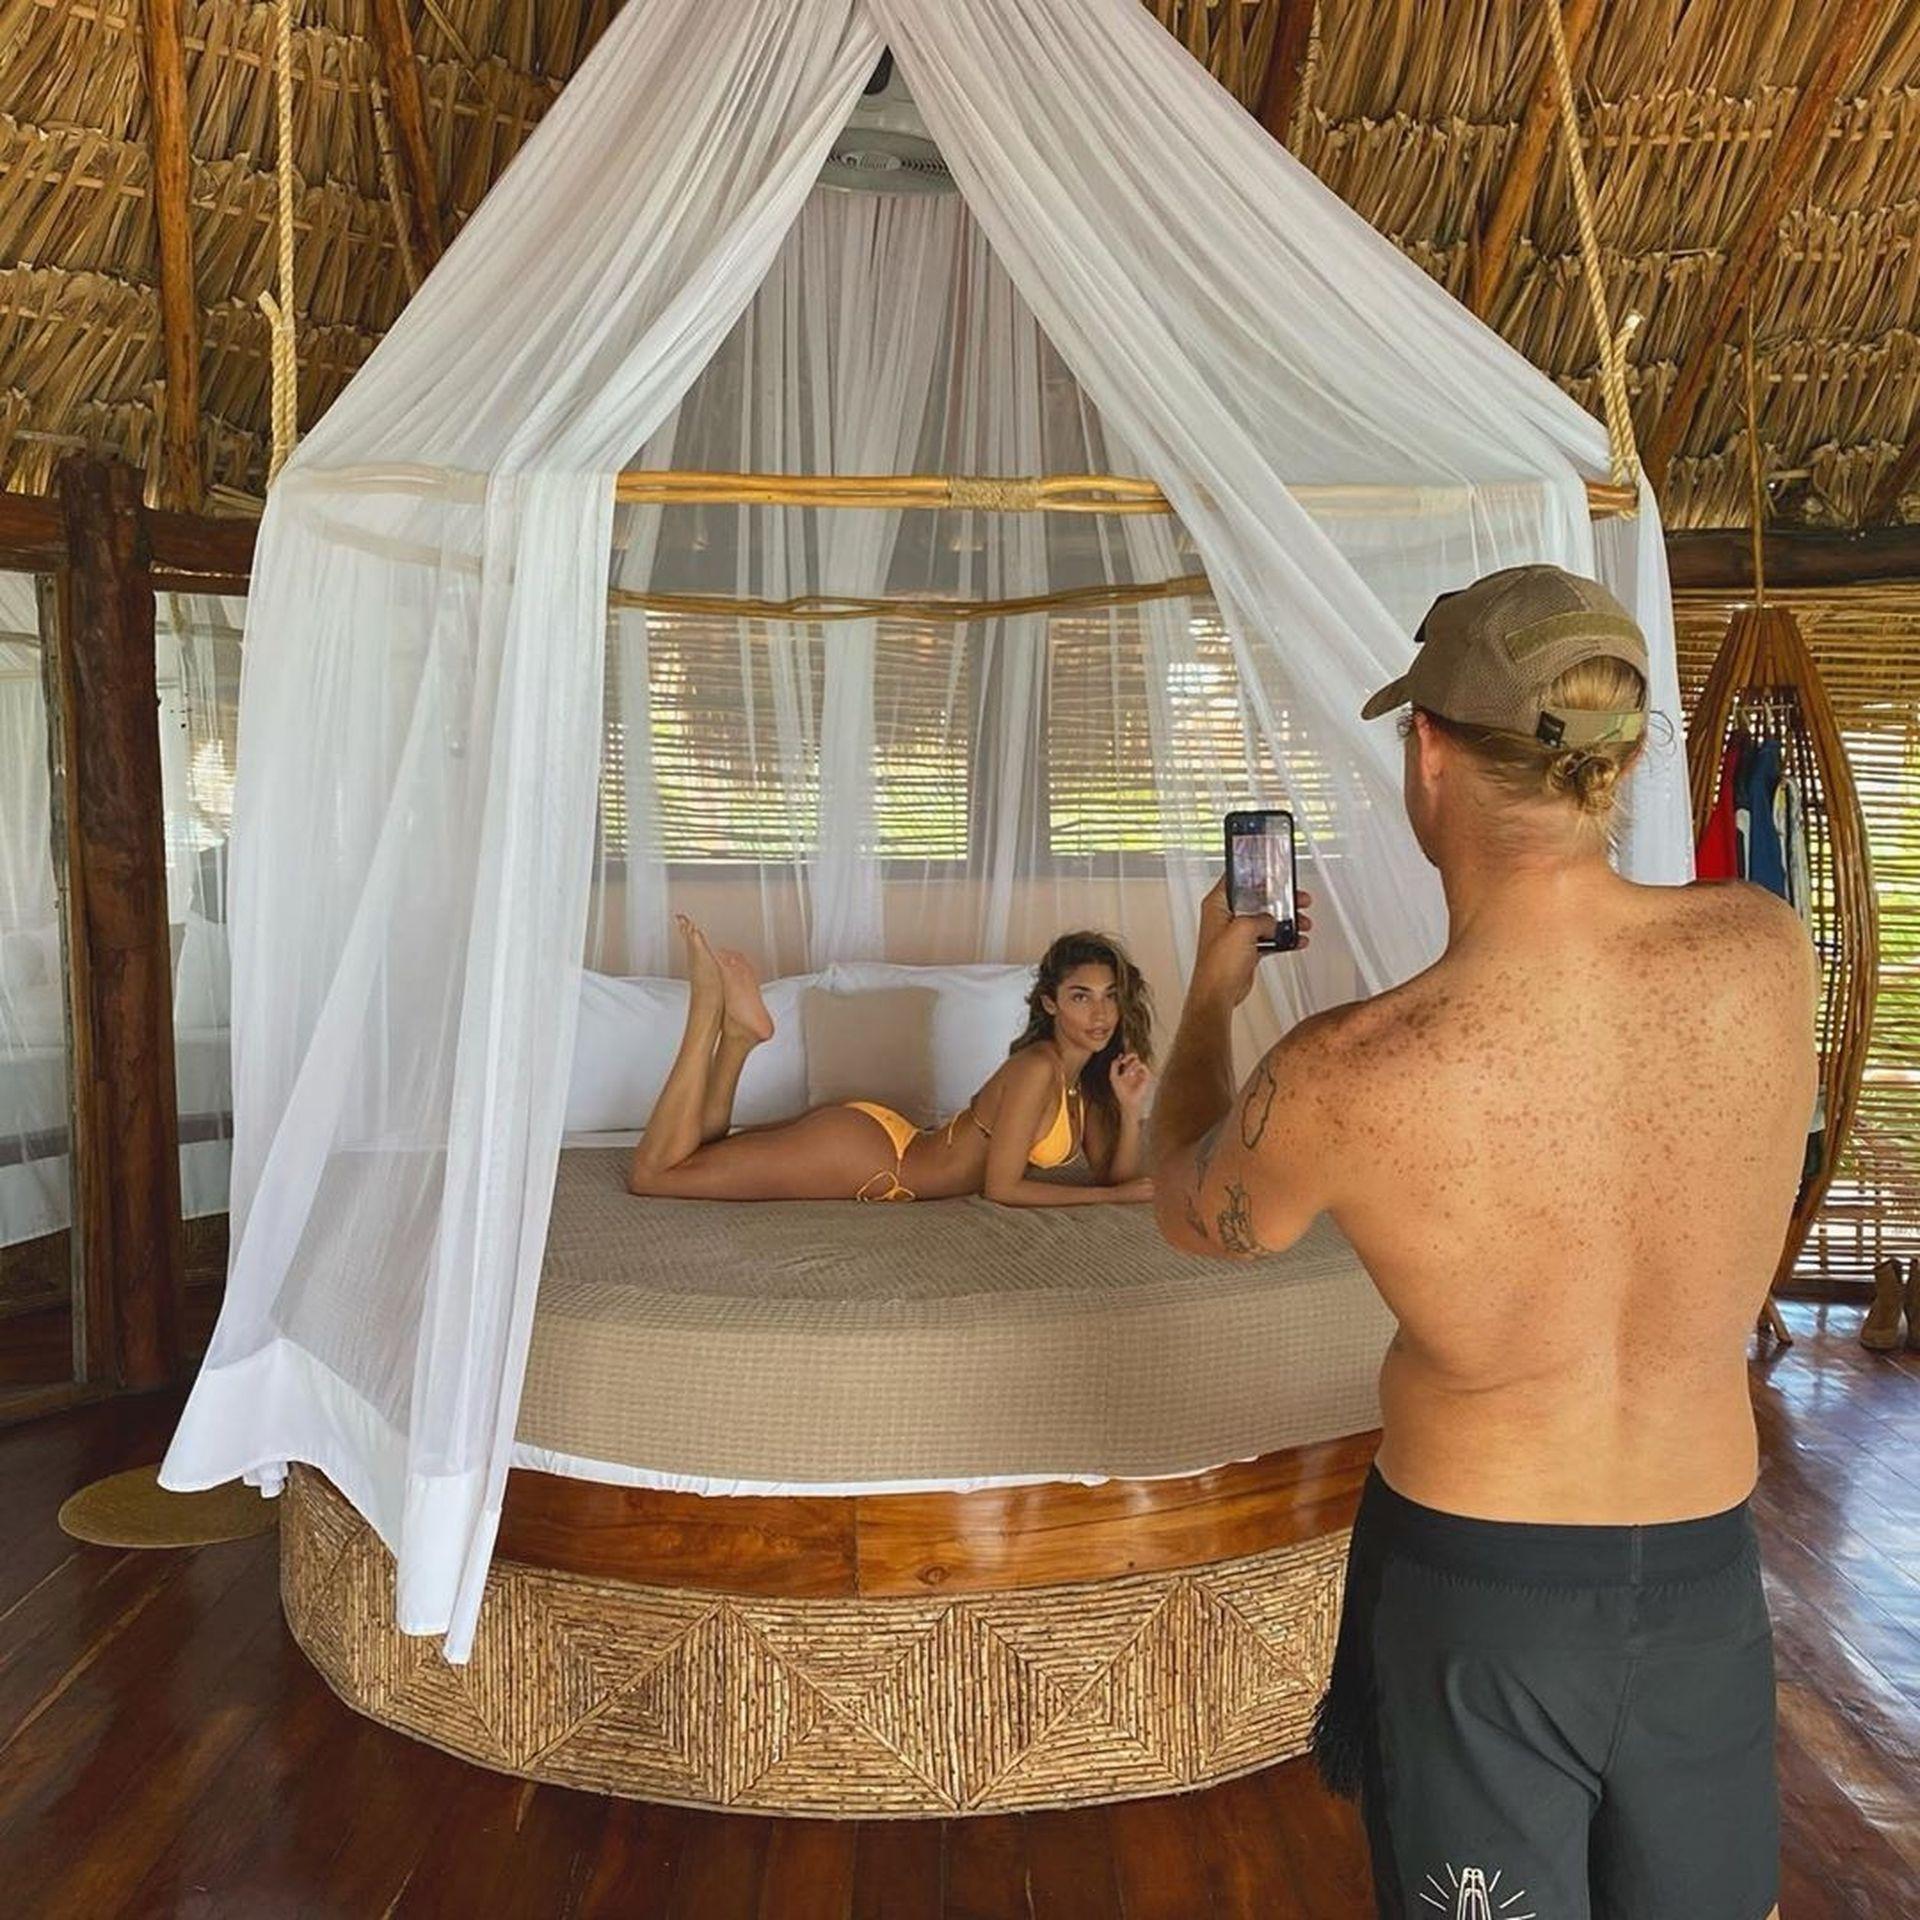 Chantel Jeffries And Dj Diplo Take Their New Love To Mexico 0042